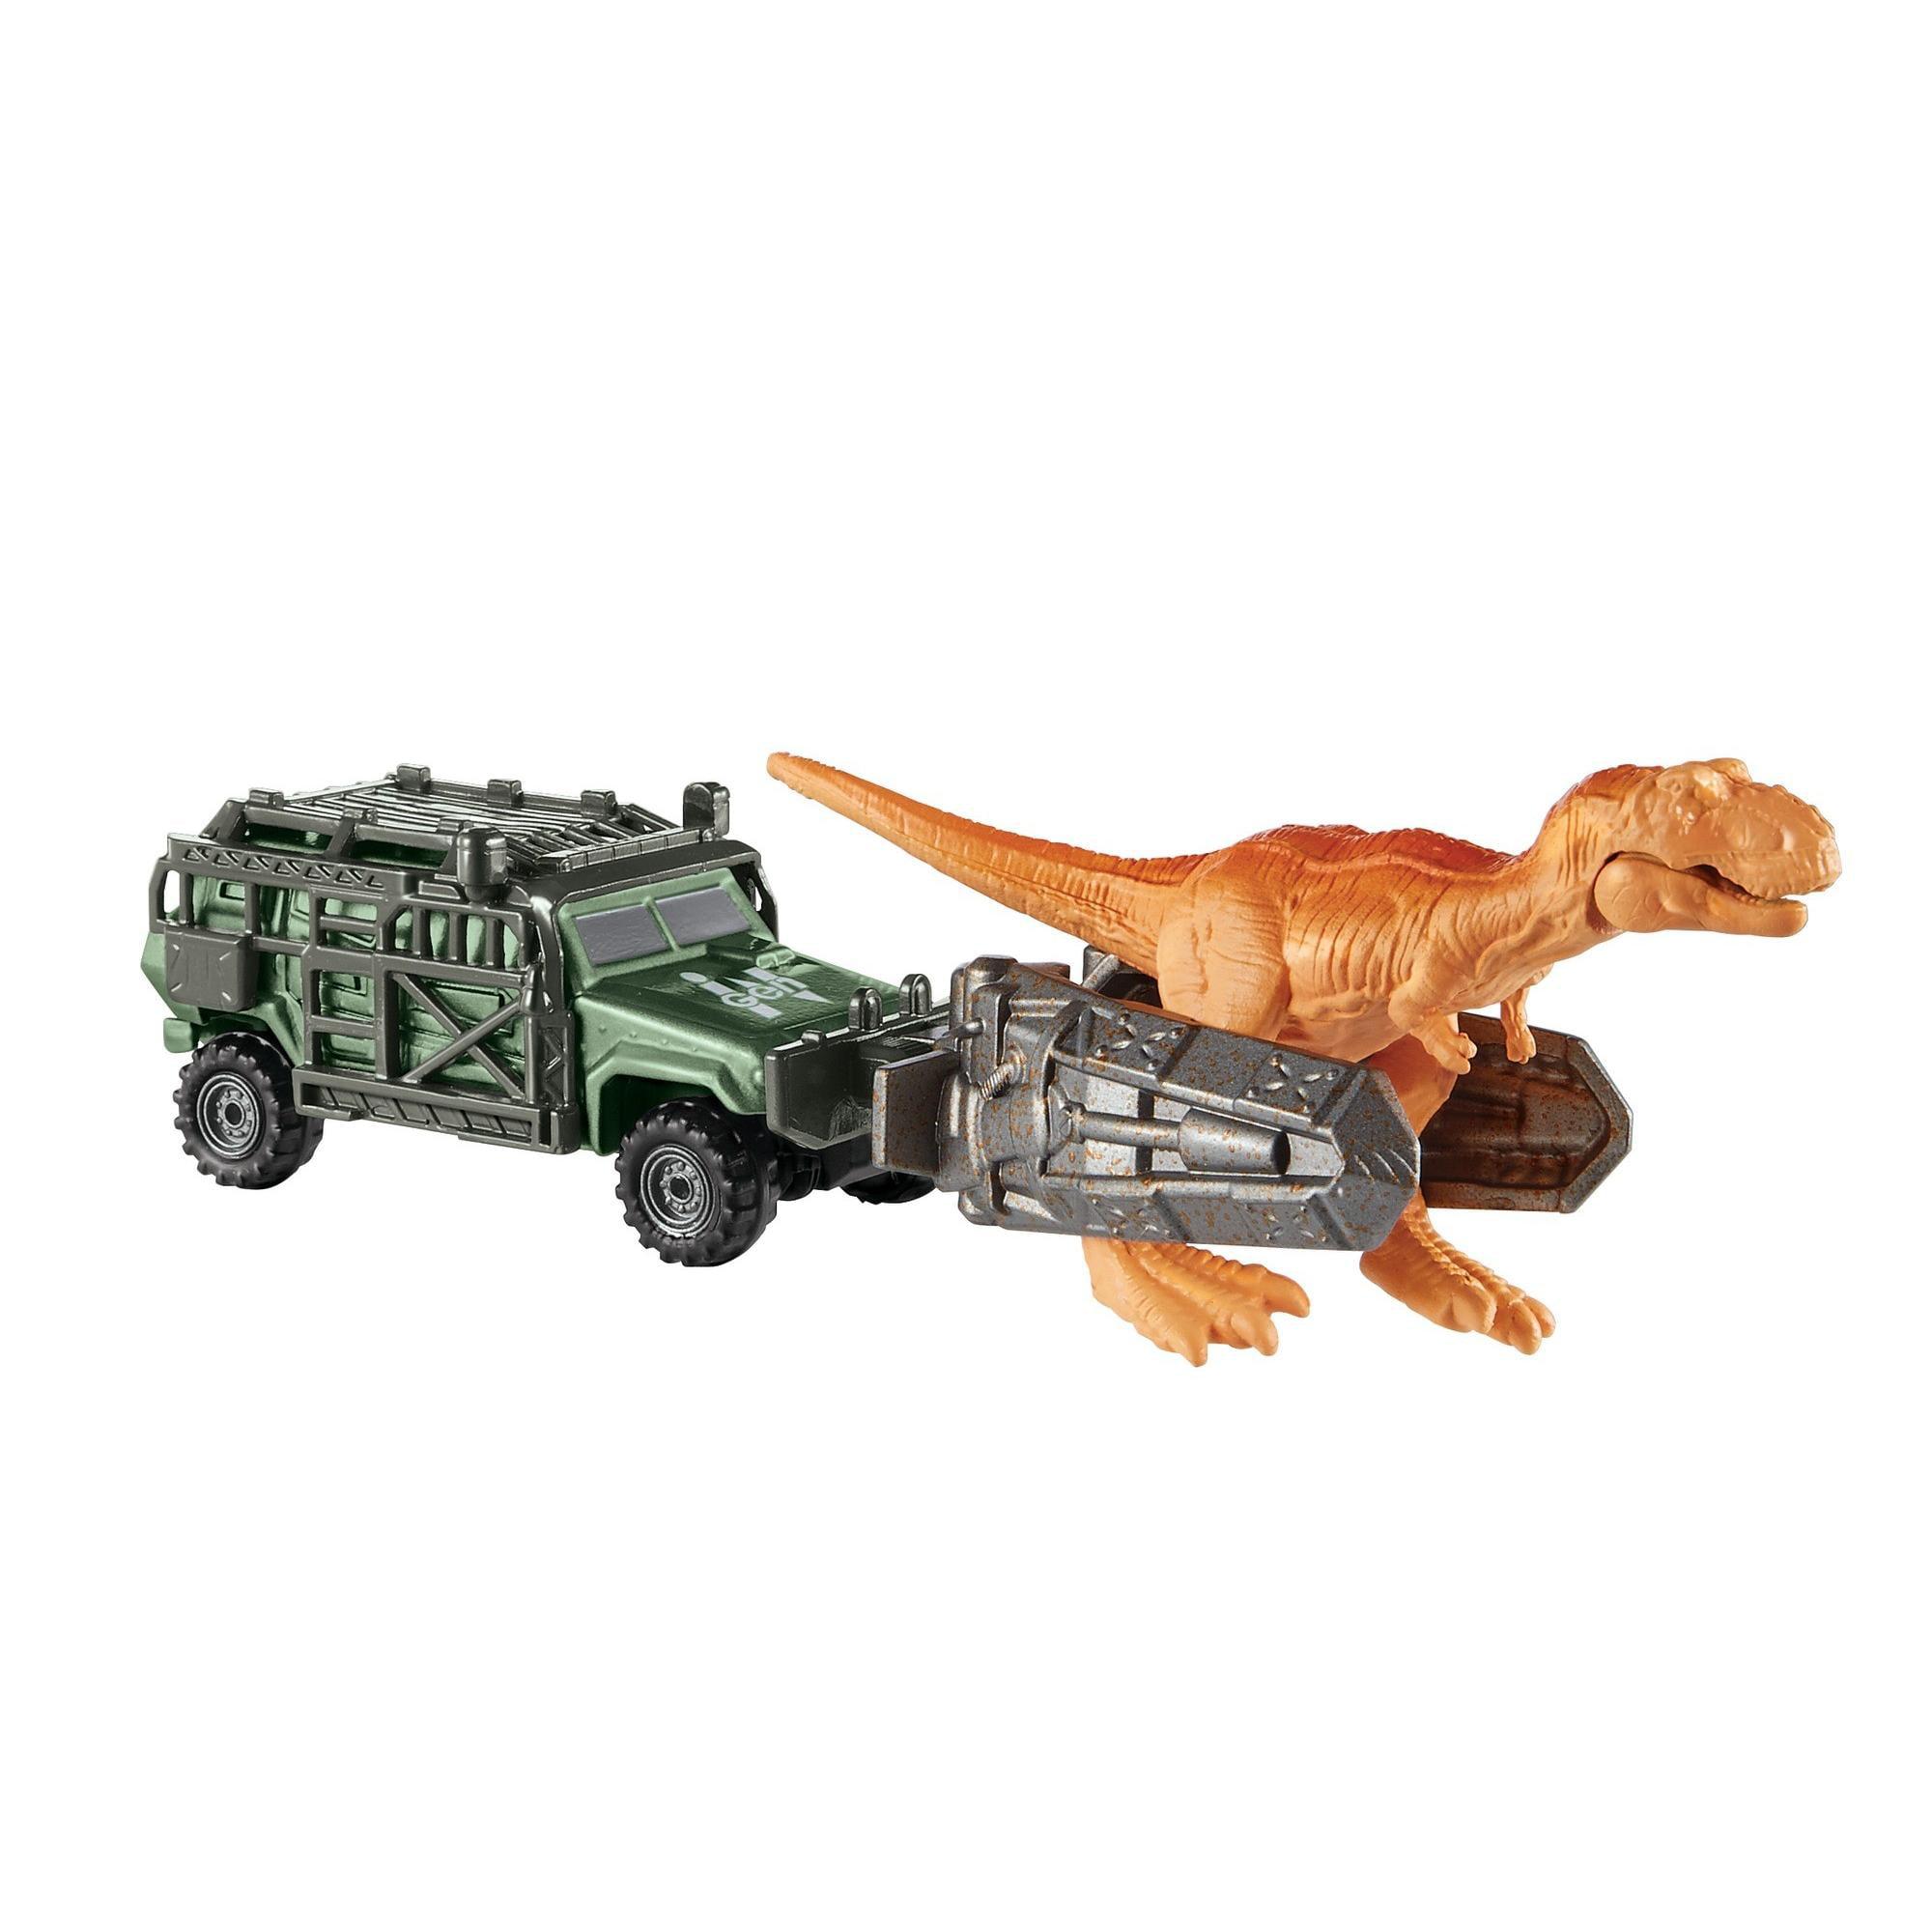 MATCHBOX Jurassic World Dino transporteur-TRICERA-Tracker-FMY35